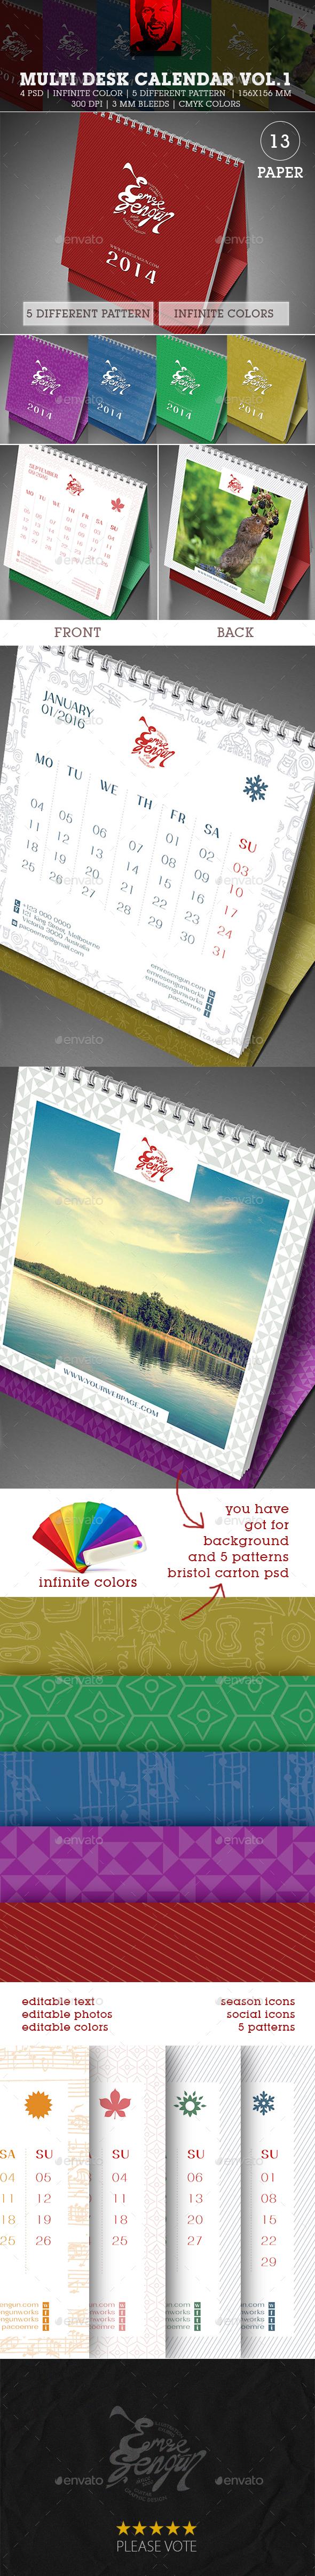 2016 Multi Desk Calendar Vol.1 - Calendars Stationery